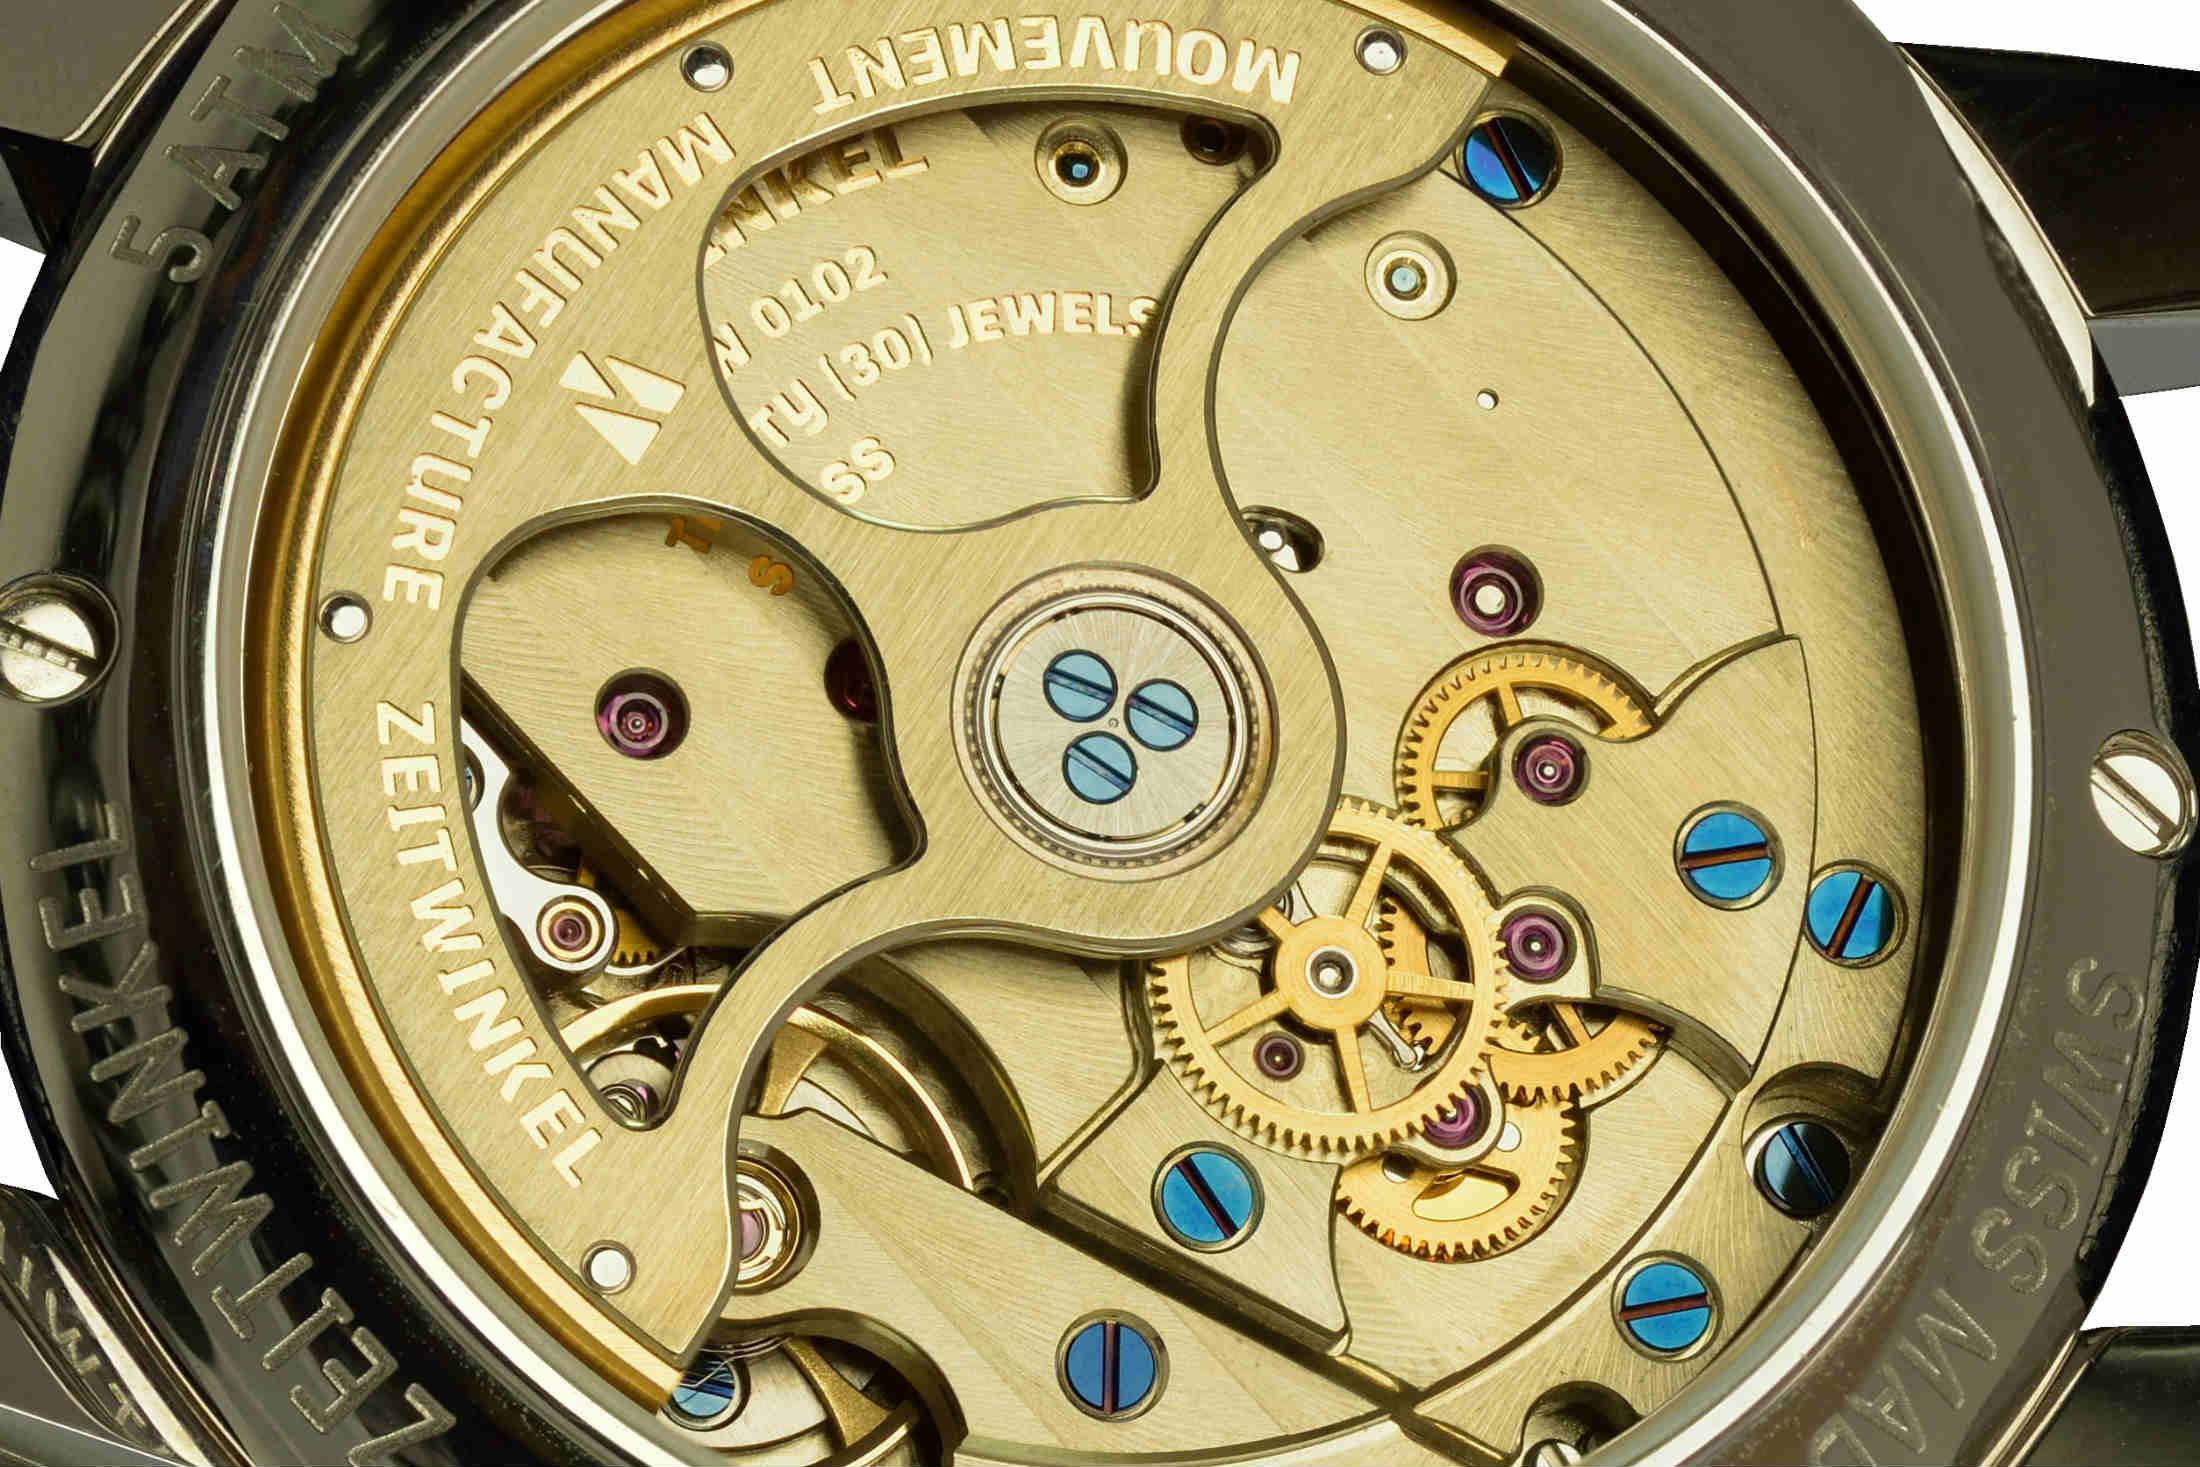 Zeitwinkel in-house Swiss watch movement